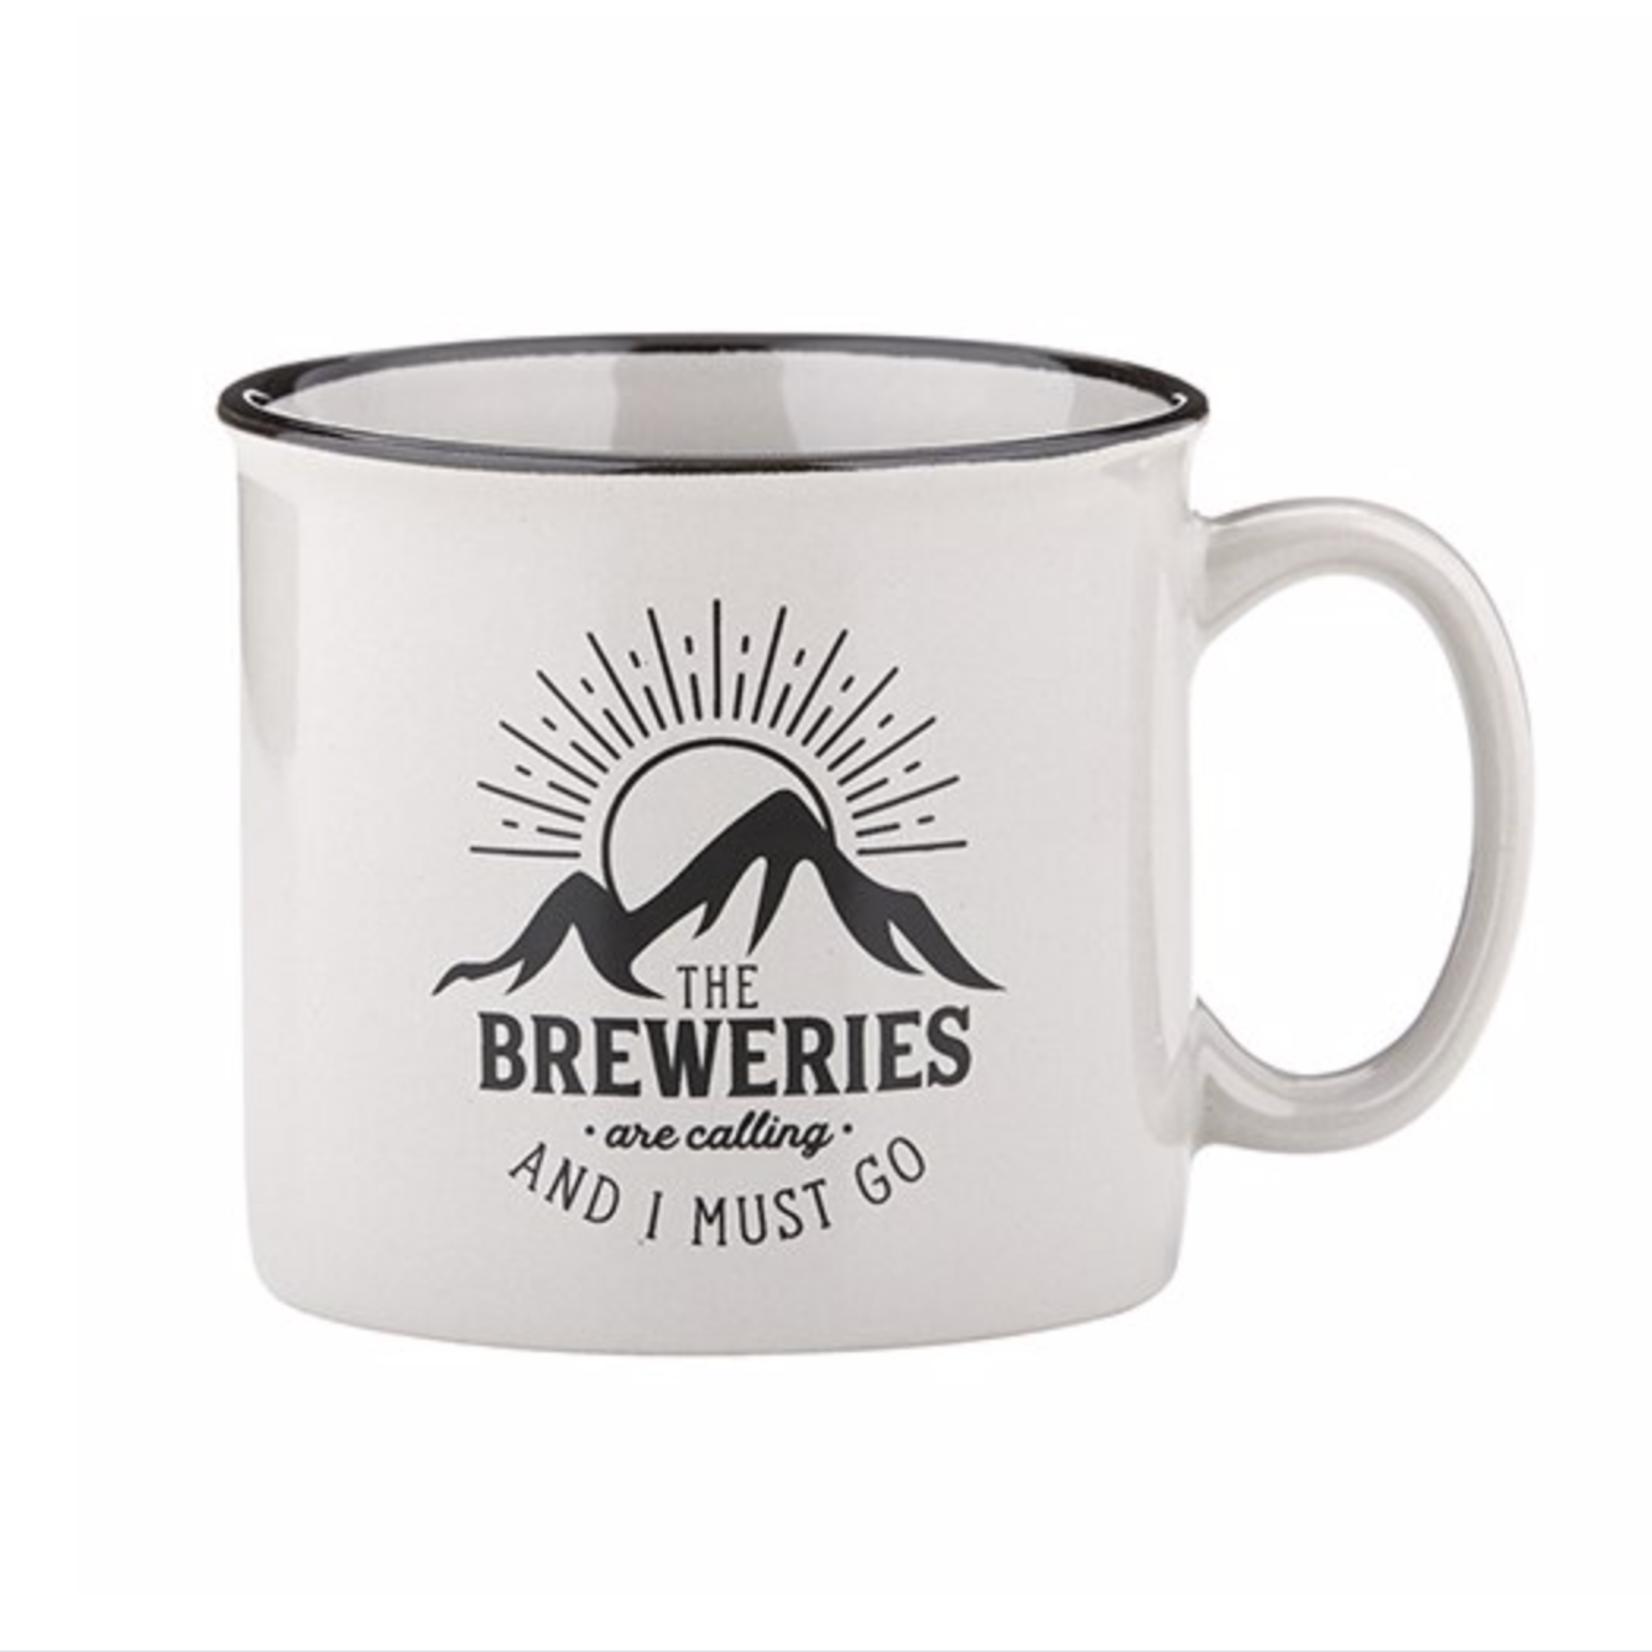 SB Designs The breweries mug